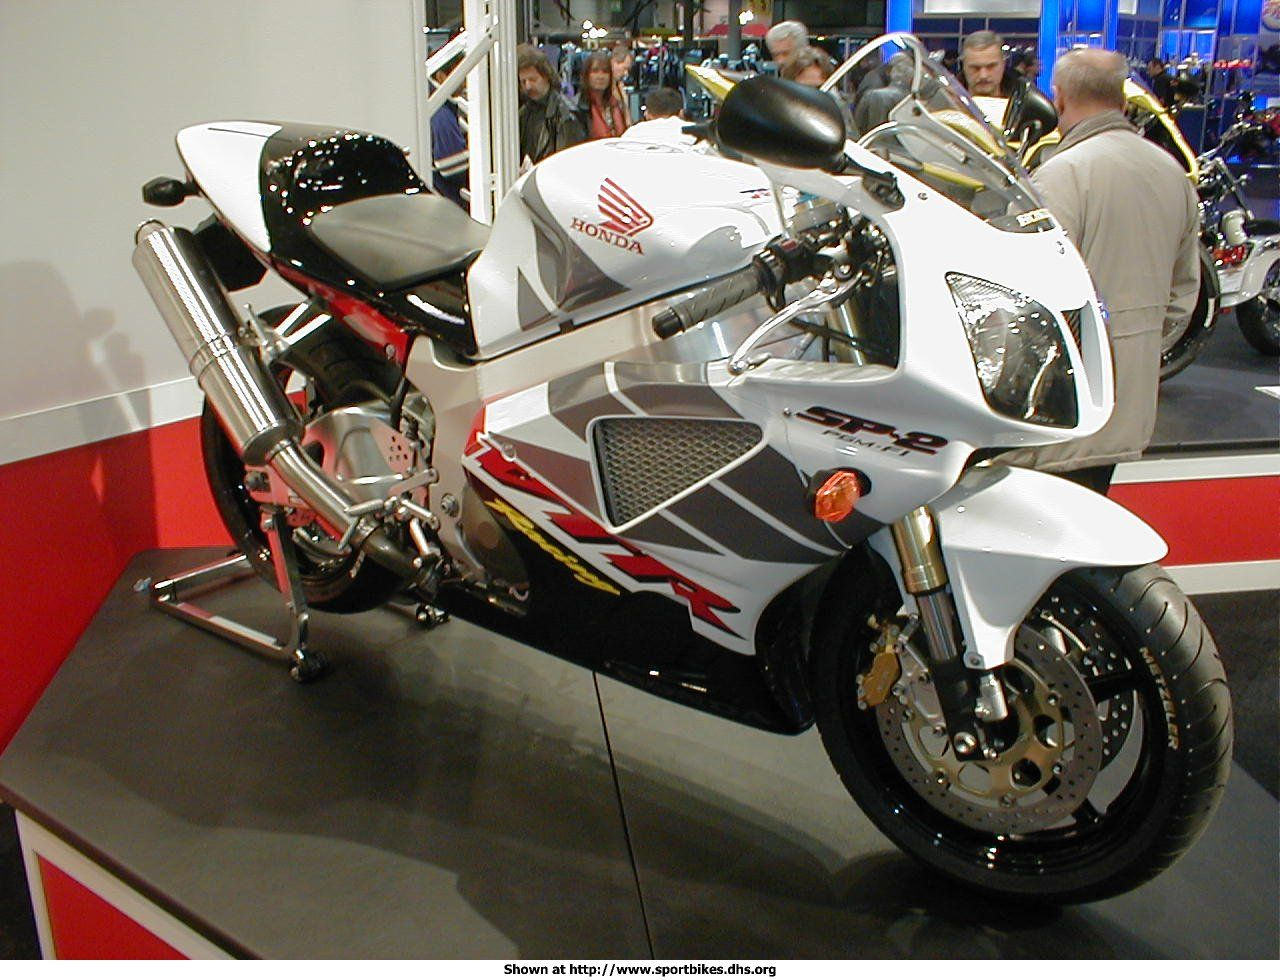 vtr 1000 sp2 sport bikes honda motorcycles honda motorcycle. Black Bedroom Furniture Sets. Home Design Ideas